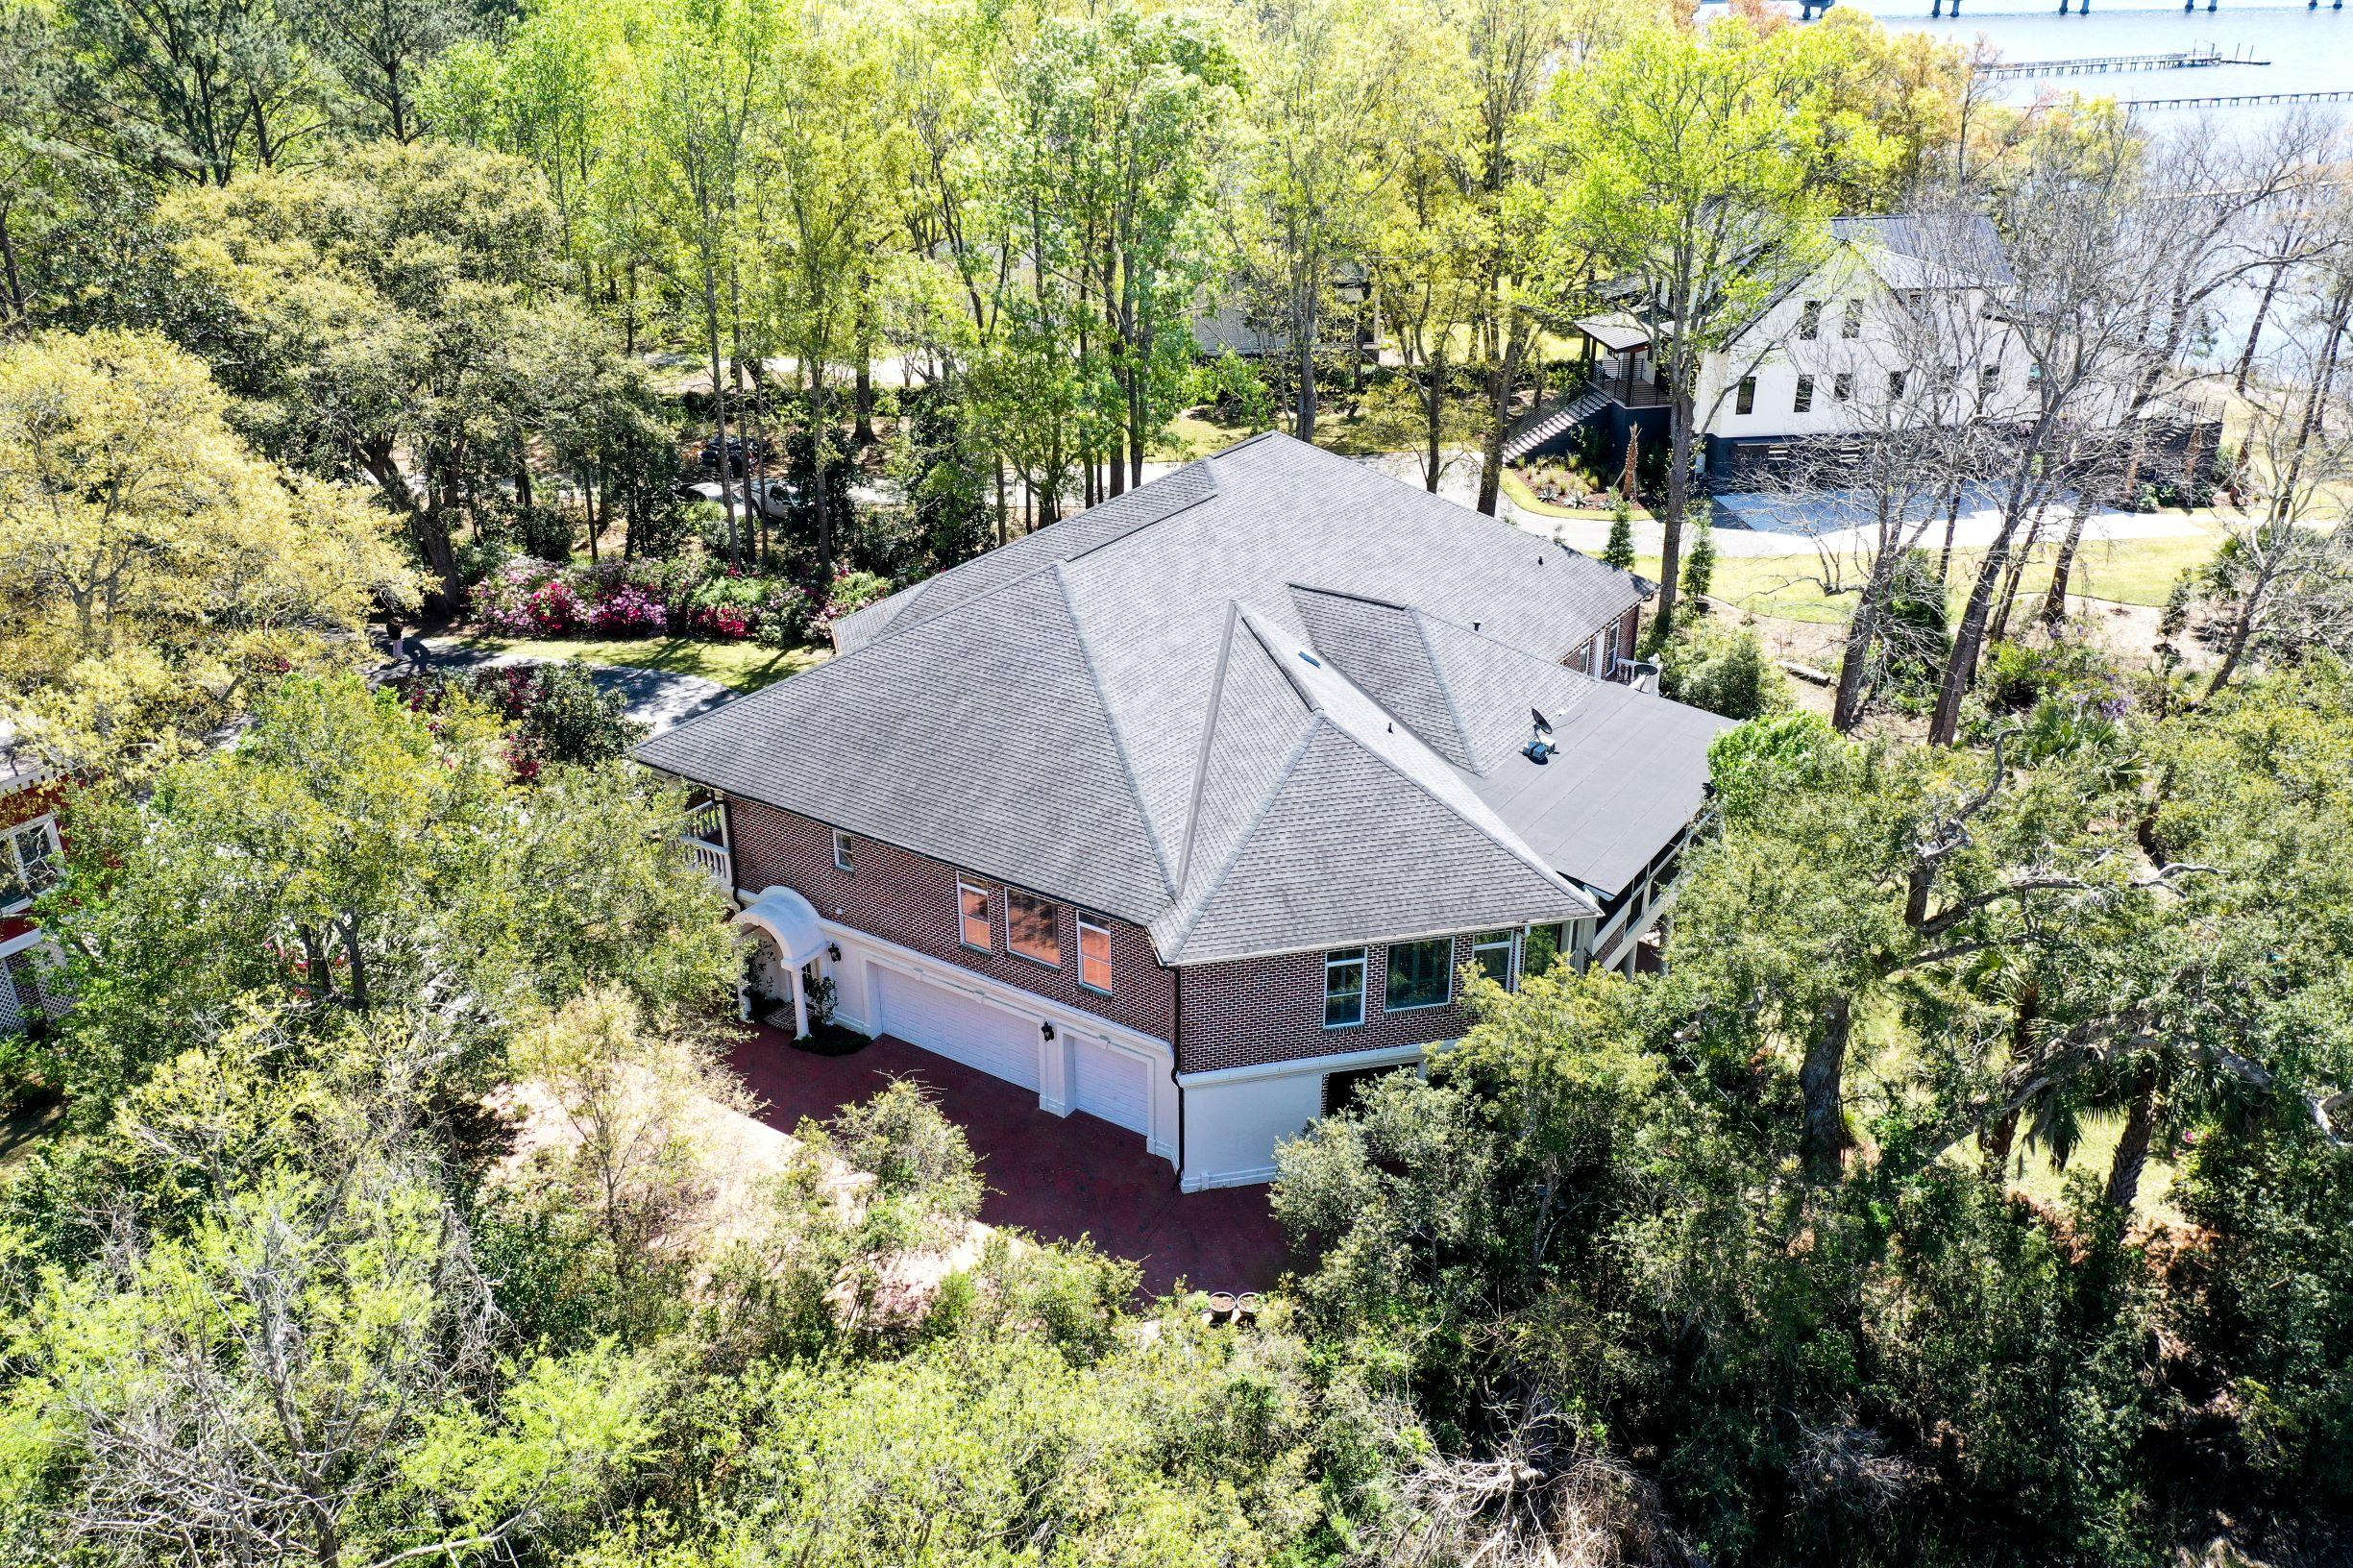 Cainhoy Landing Homes For Sale - 112 Cainhoy Landing, Charleston, SC - 83